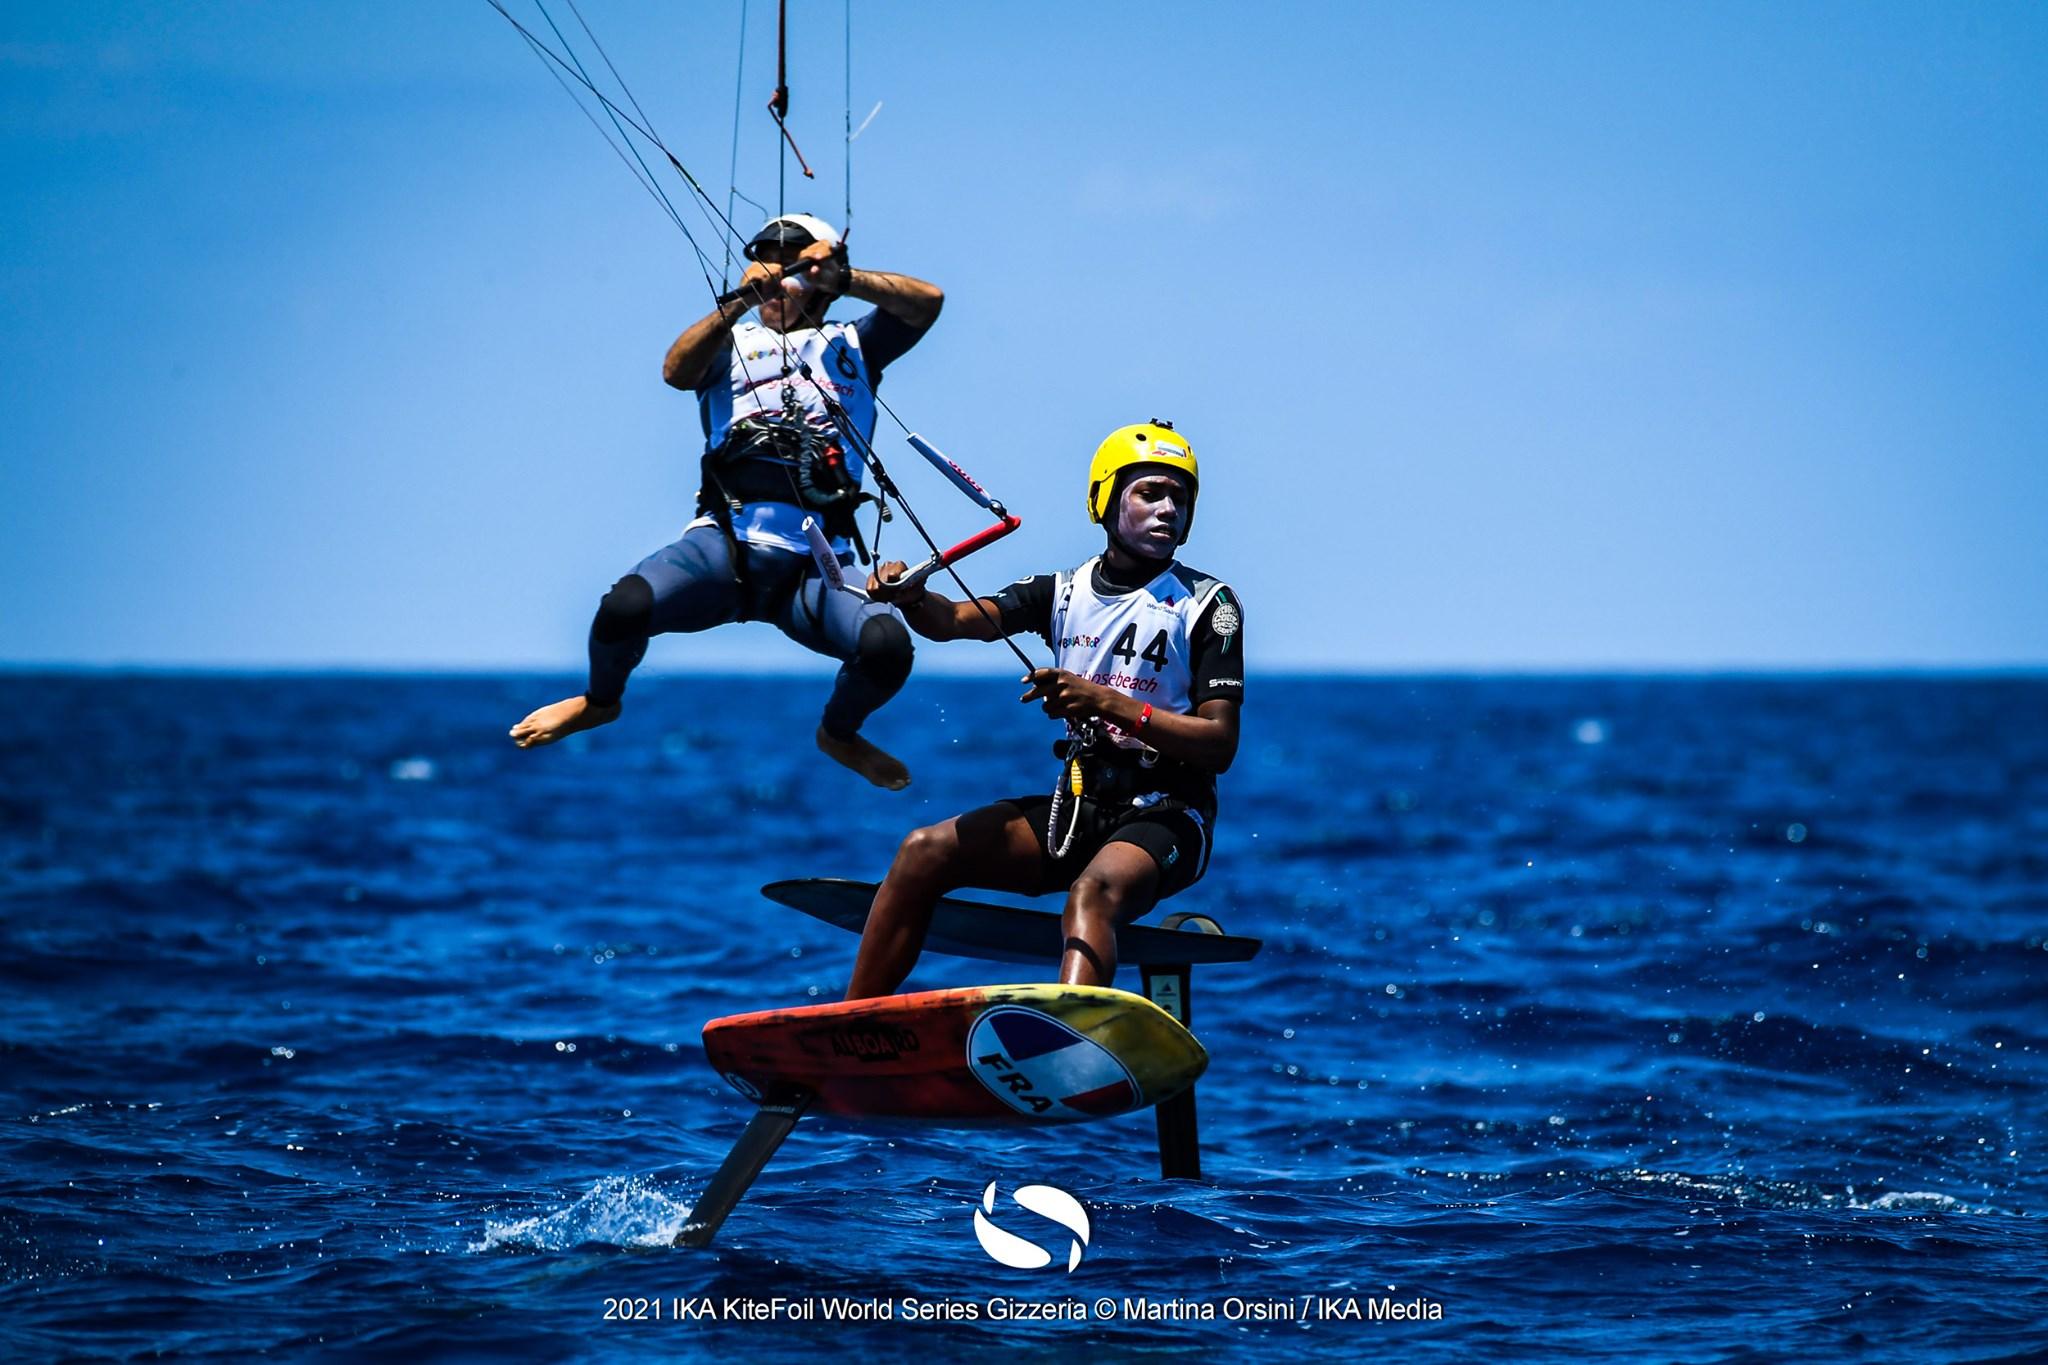 2 kitefoilers. One kitefoiler jumping in the air